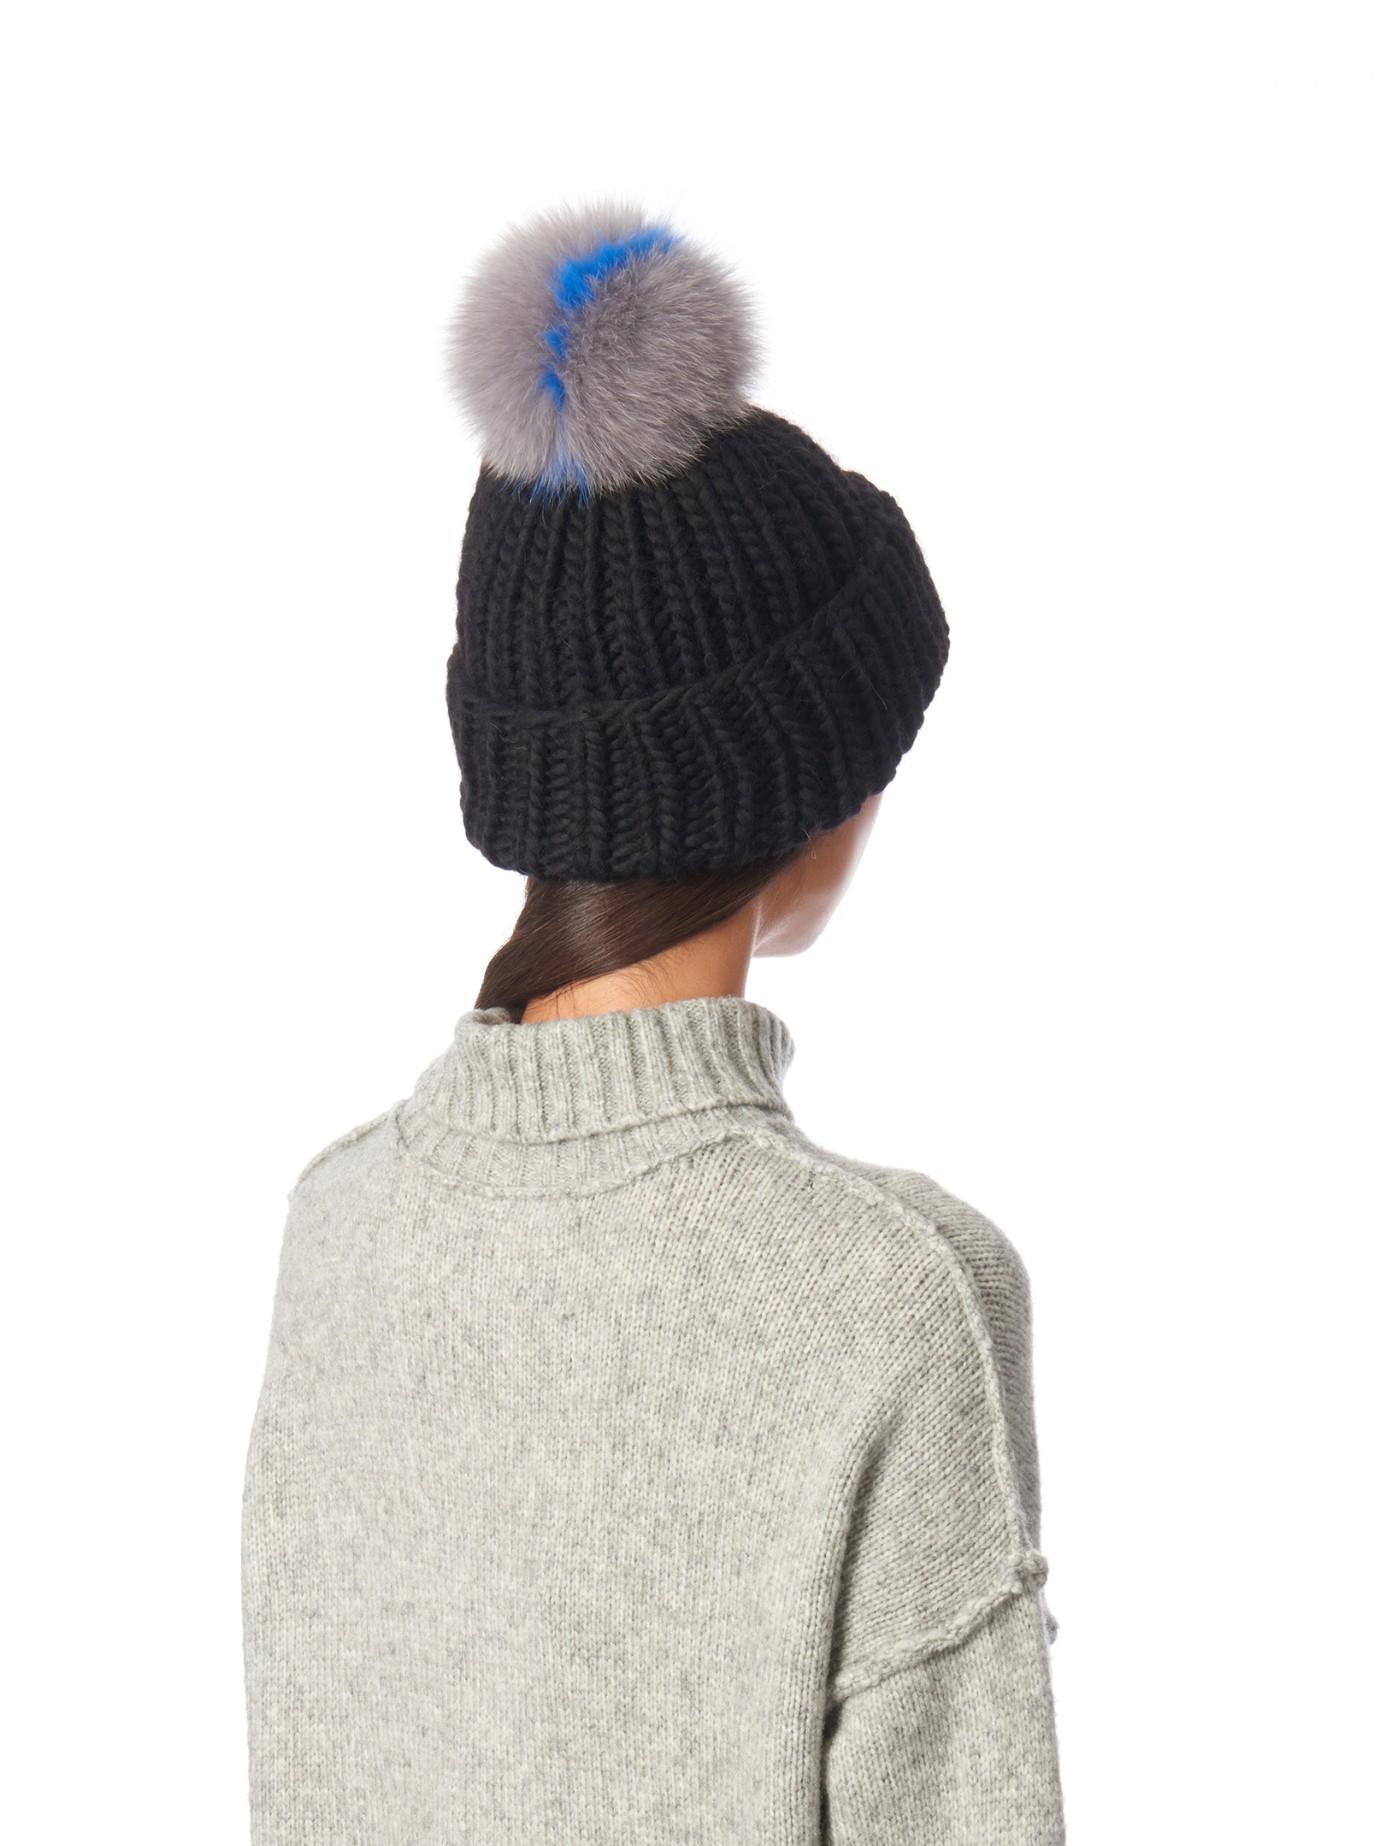 Lyst - Eugenia Kim Rain Fur Pompom Beanie Hat in Black 57488ba309e